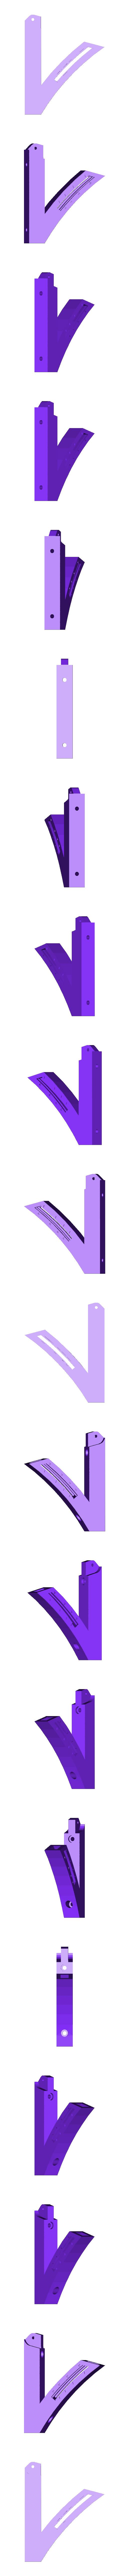 EscuadrasBaseV4.stl Download STL file Adjustable Projector Shelf Bracket • Design to 3D print, 3-Dedulce